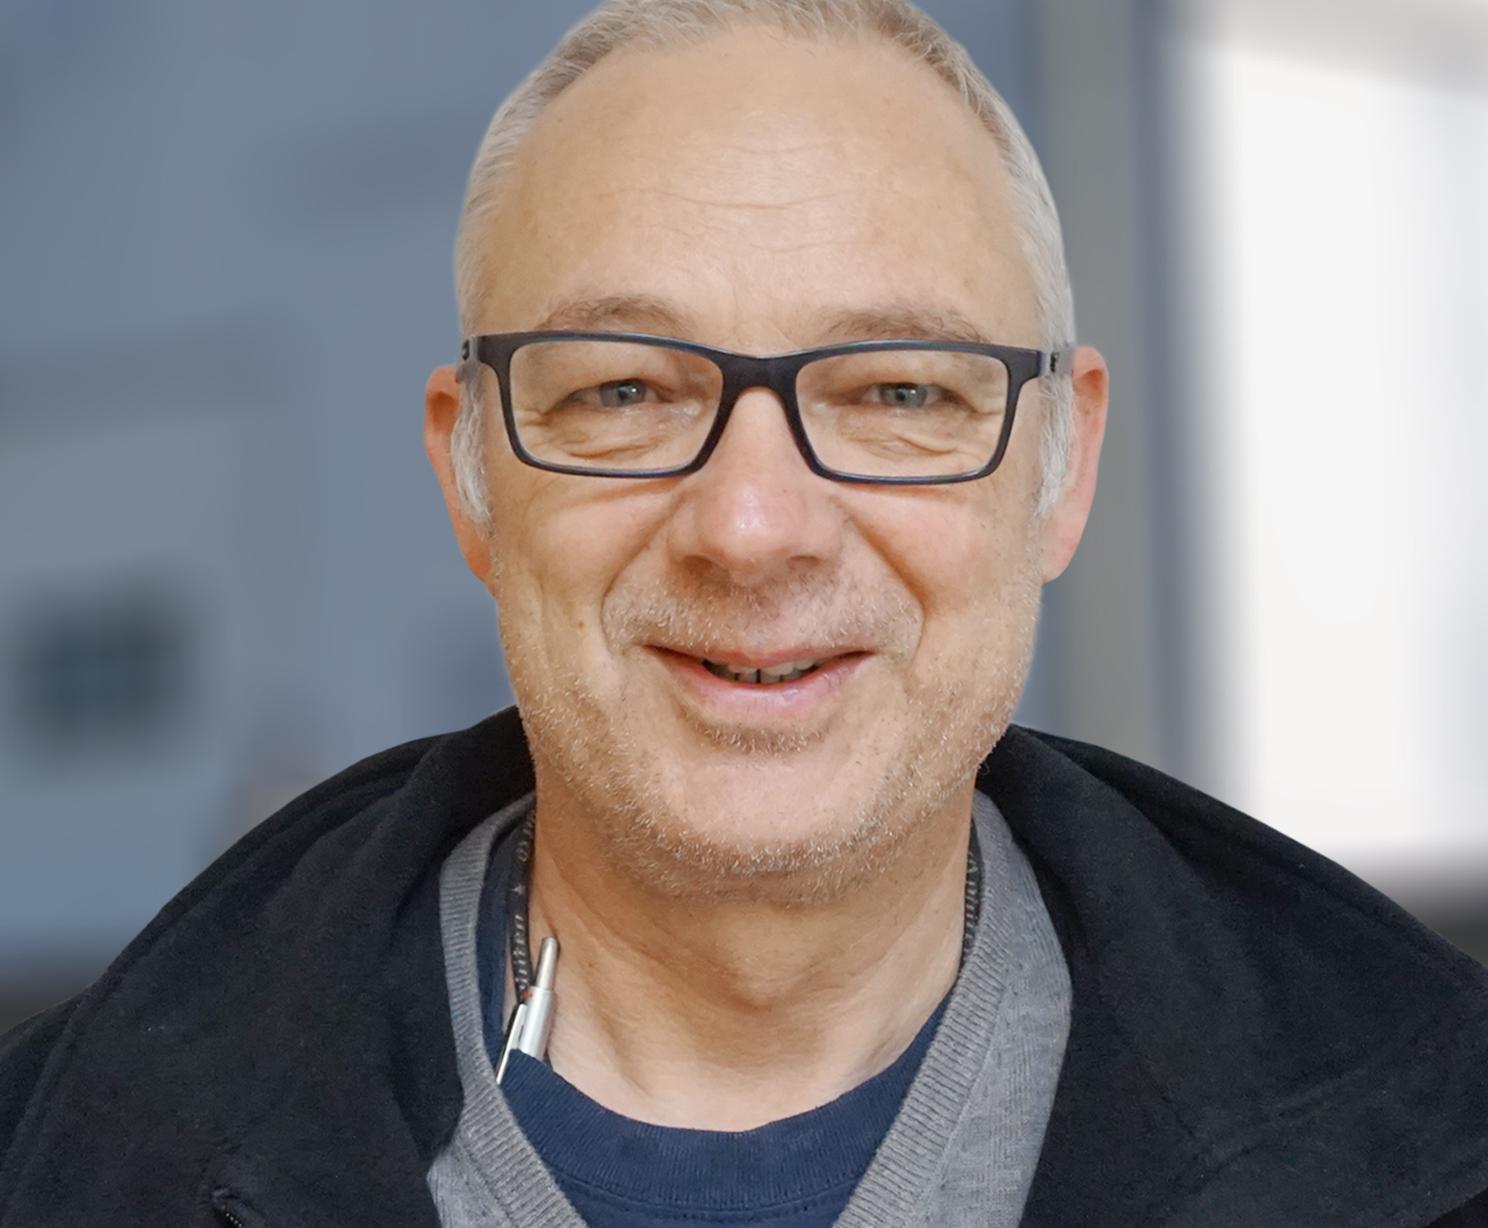 Jörg Pabst